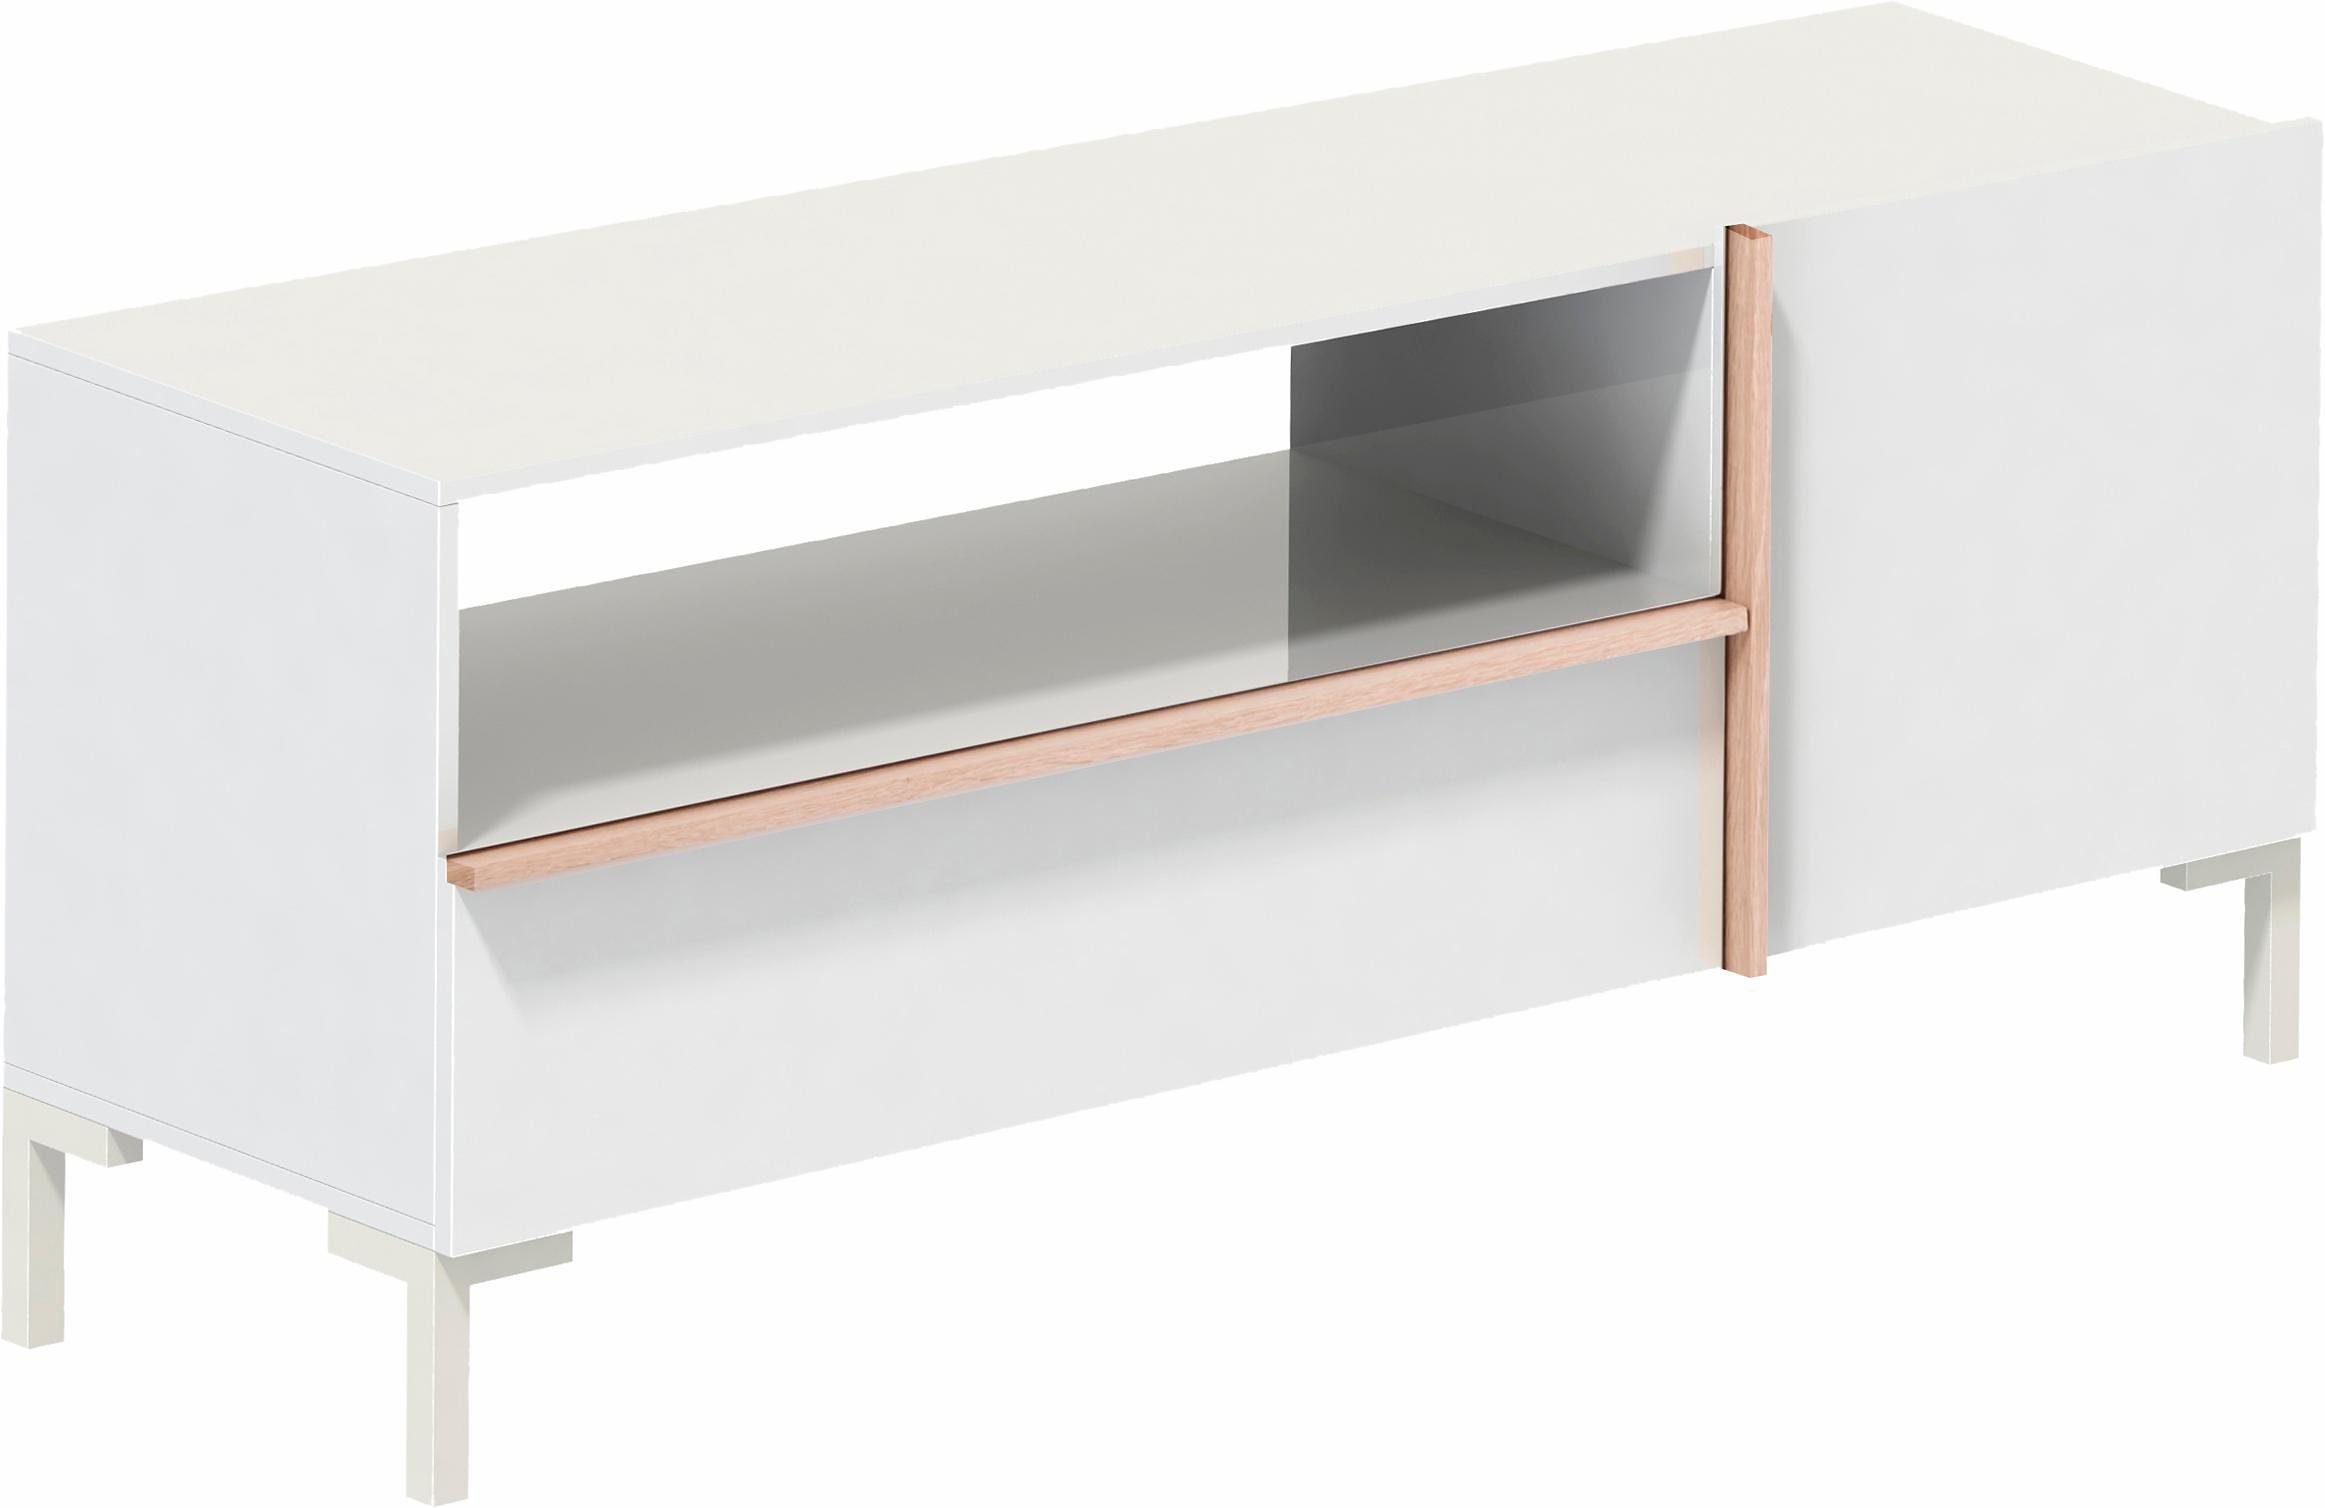 INOSIGN Lowboard, Breite 140 cm